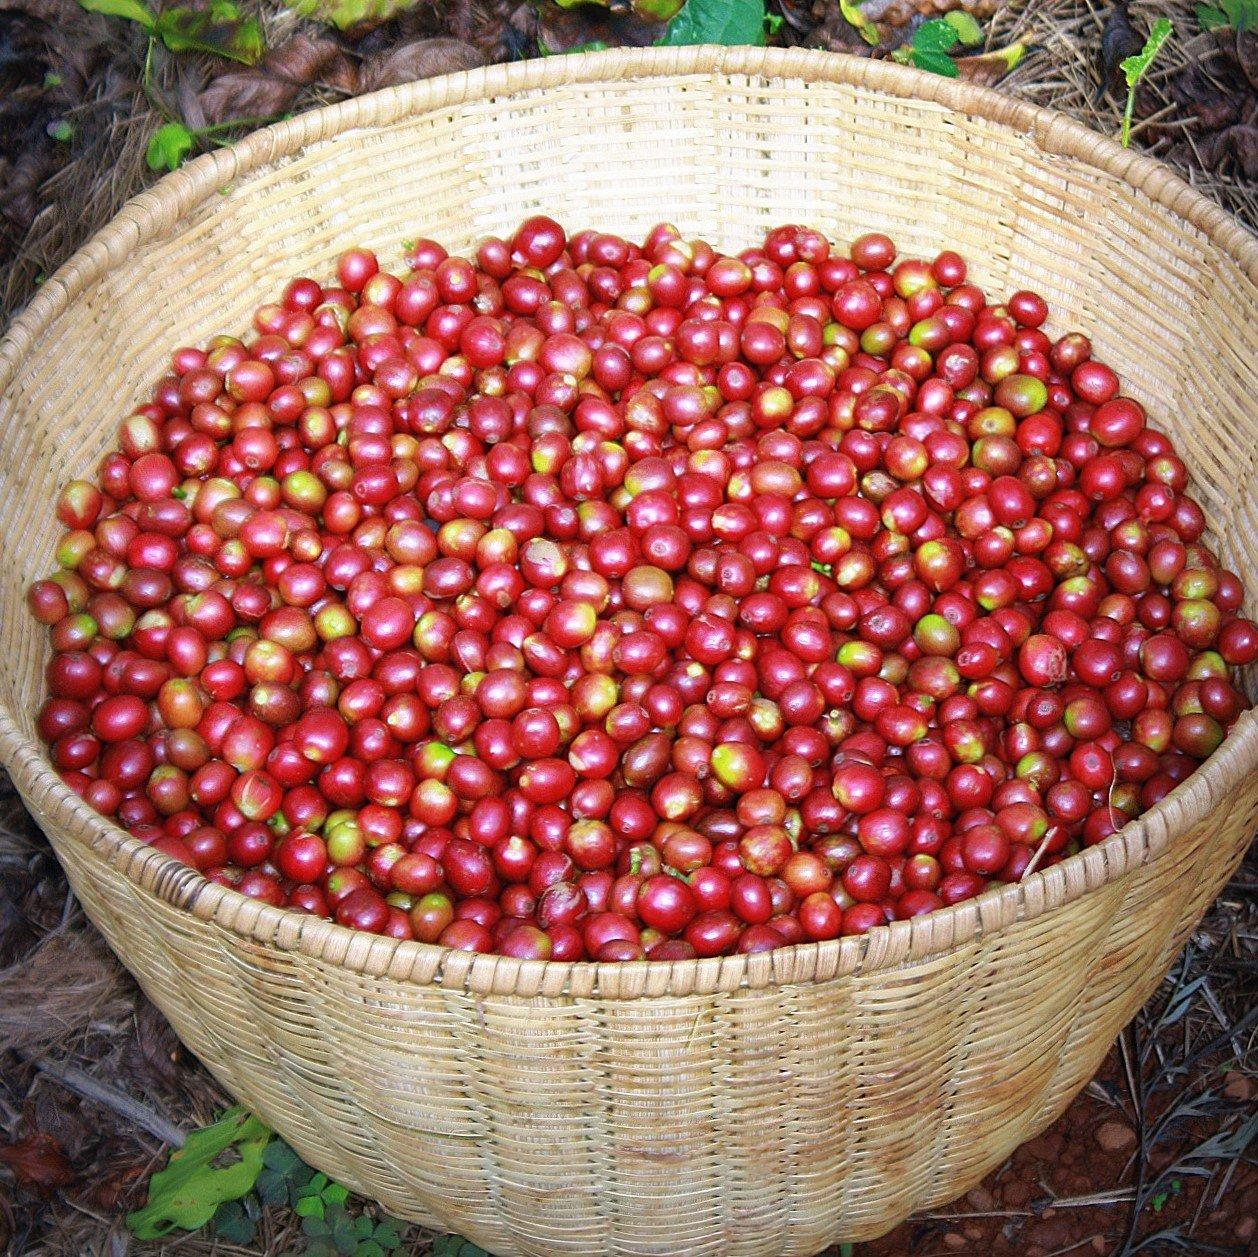 Honduras ORGANIC Copan (5 lbs) Unroasted Green Coffee Beans, High Grown Arabica SpecialtyRaw Coffee for Home Roasting